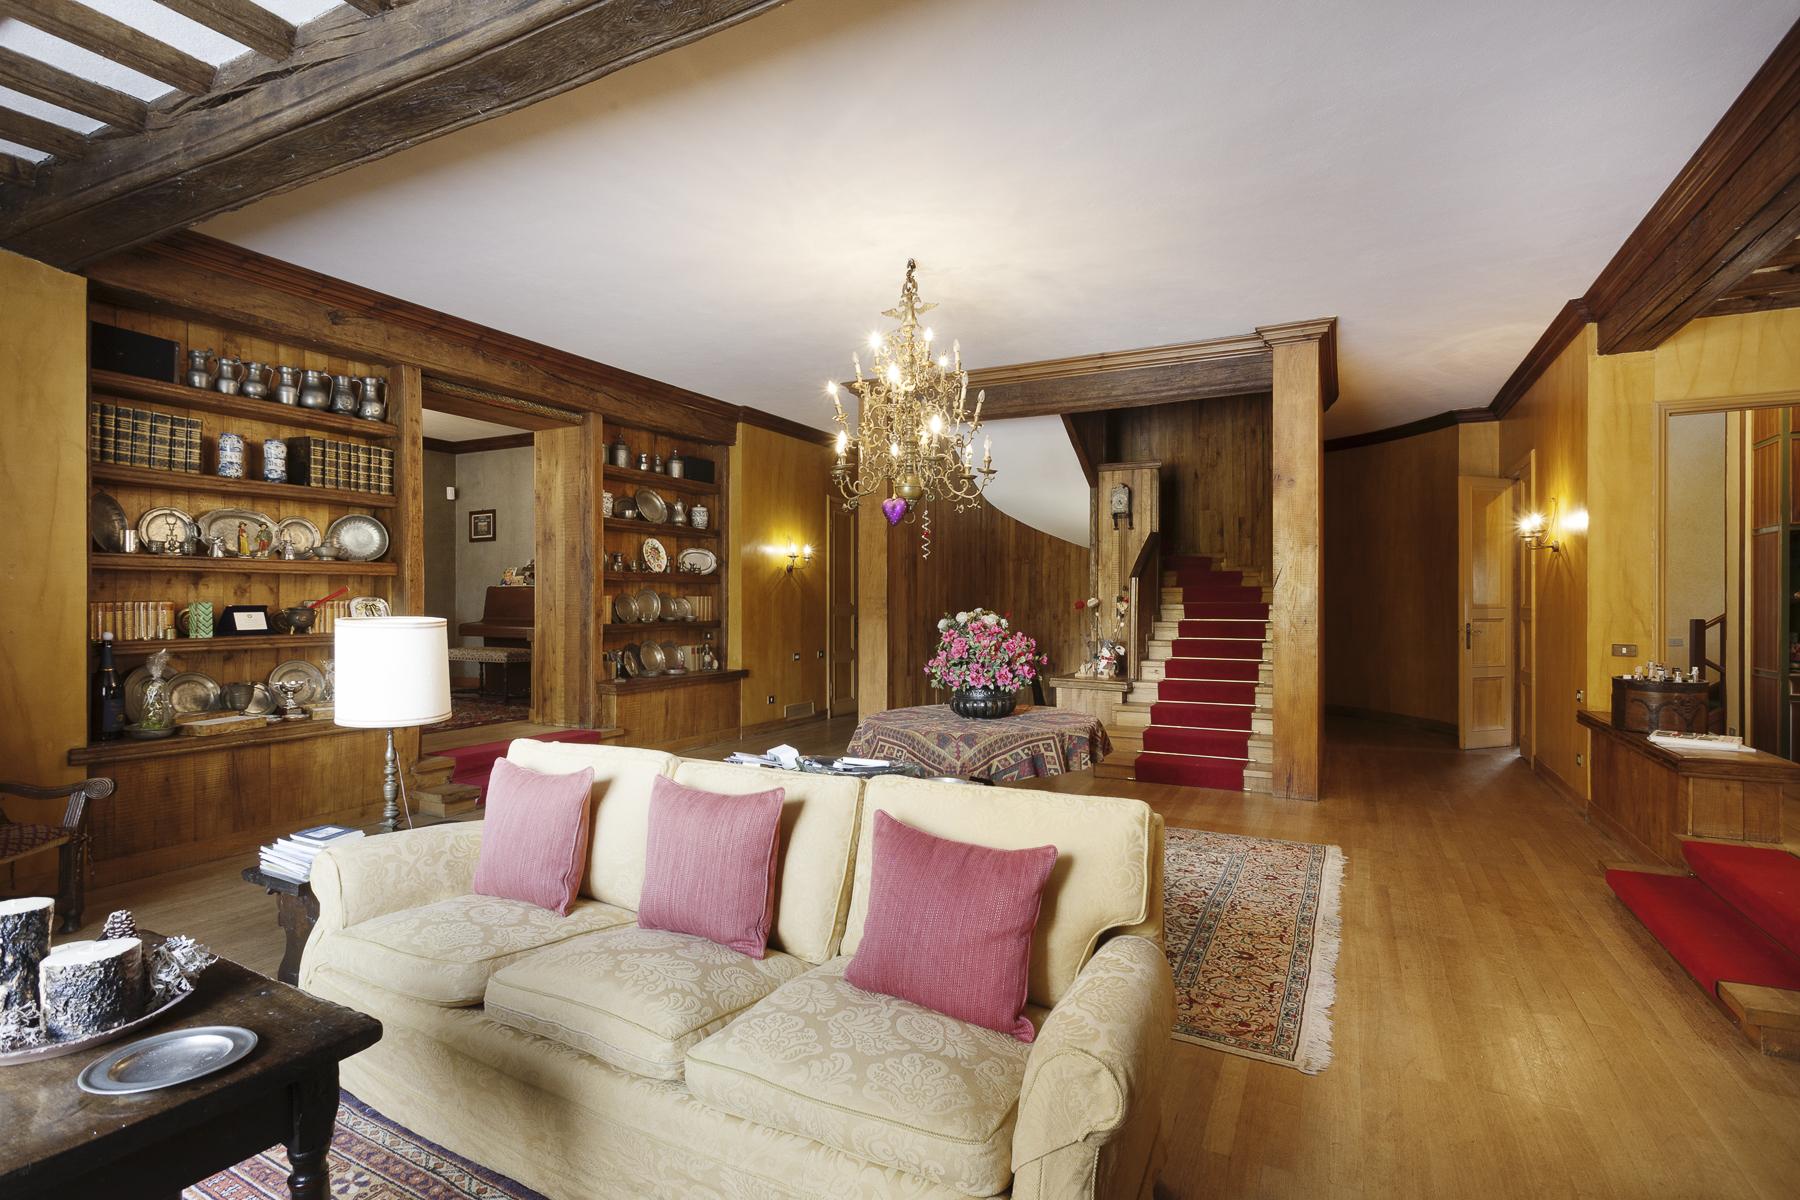 Villa in Vendita a Courmayeur: 5 locali, 900 mq - Foto 3